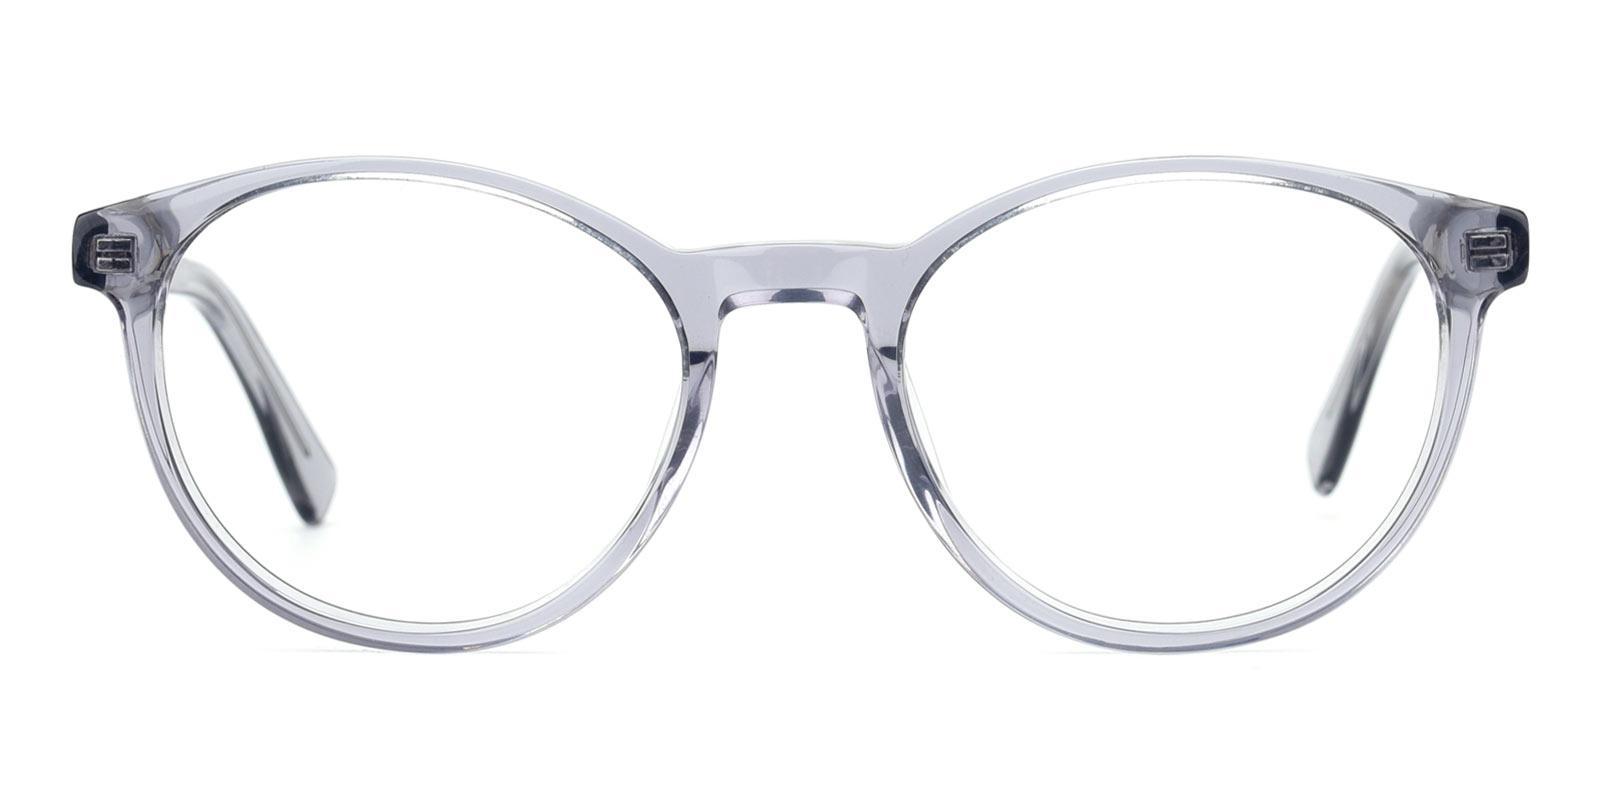 Cupid-Gray-Round-Acetate-Eyeglasses-detail